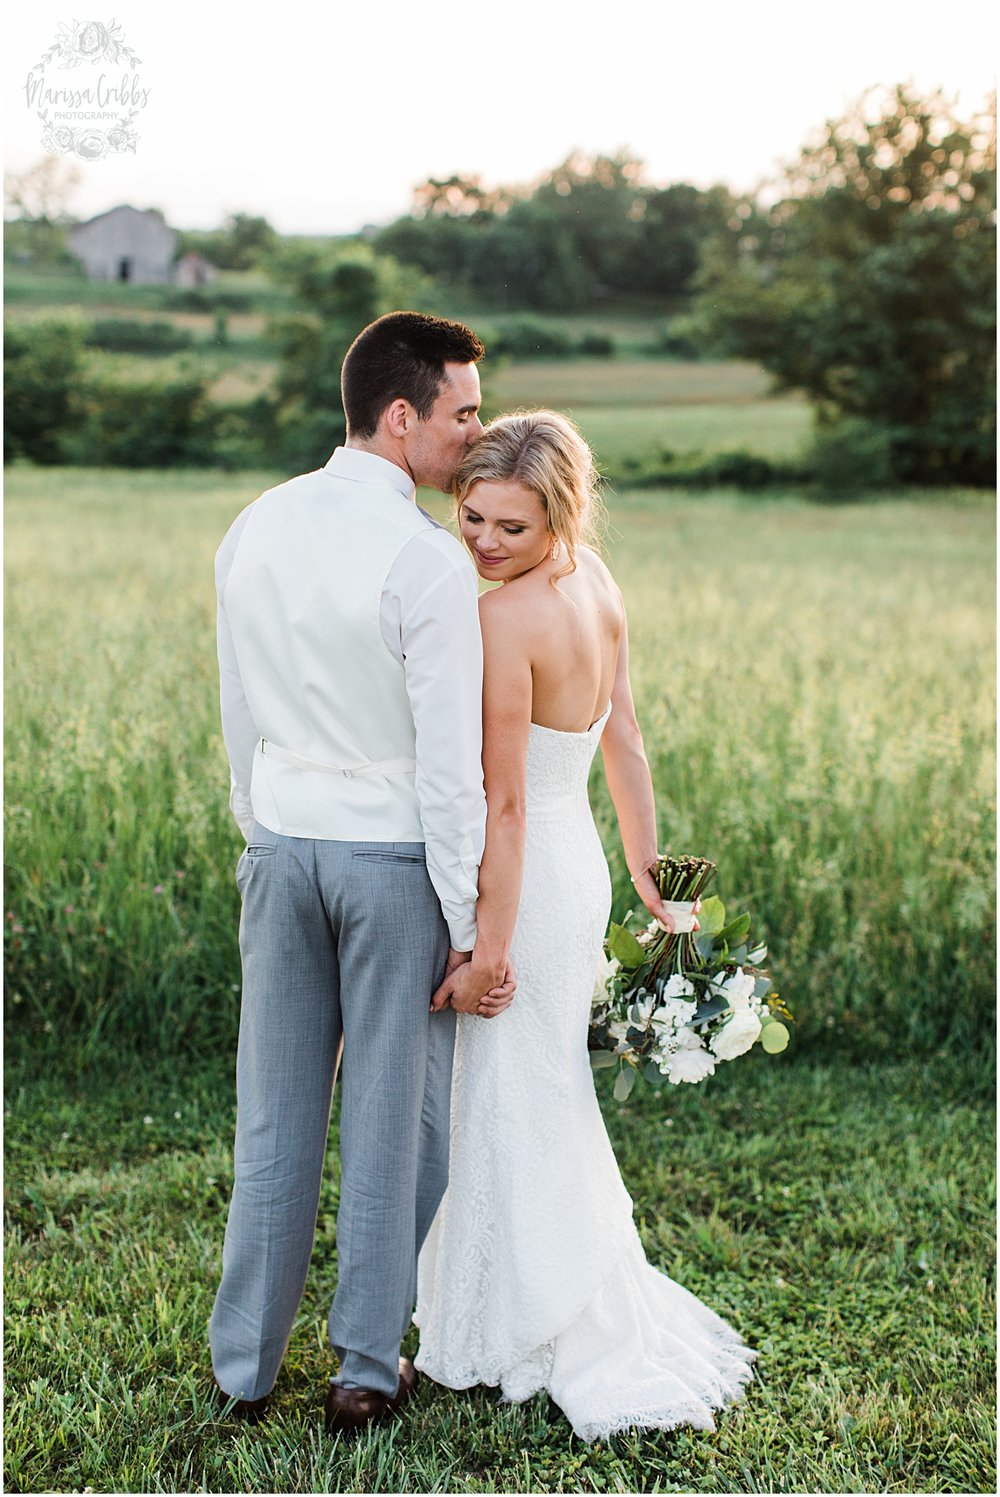 RHODES WEDDING | WESTON RED BARN FARM | MARISSA CRIBBS PHOTOGRAPHY_5327.jpg